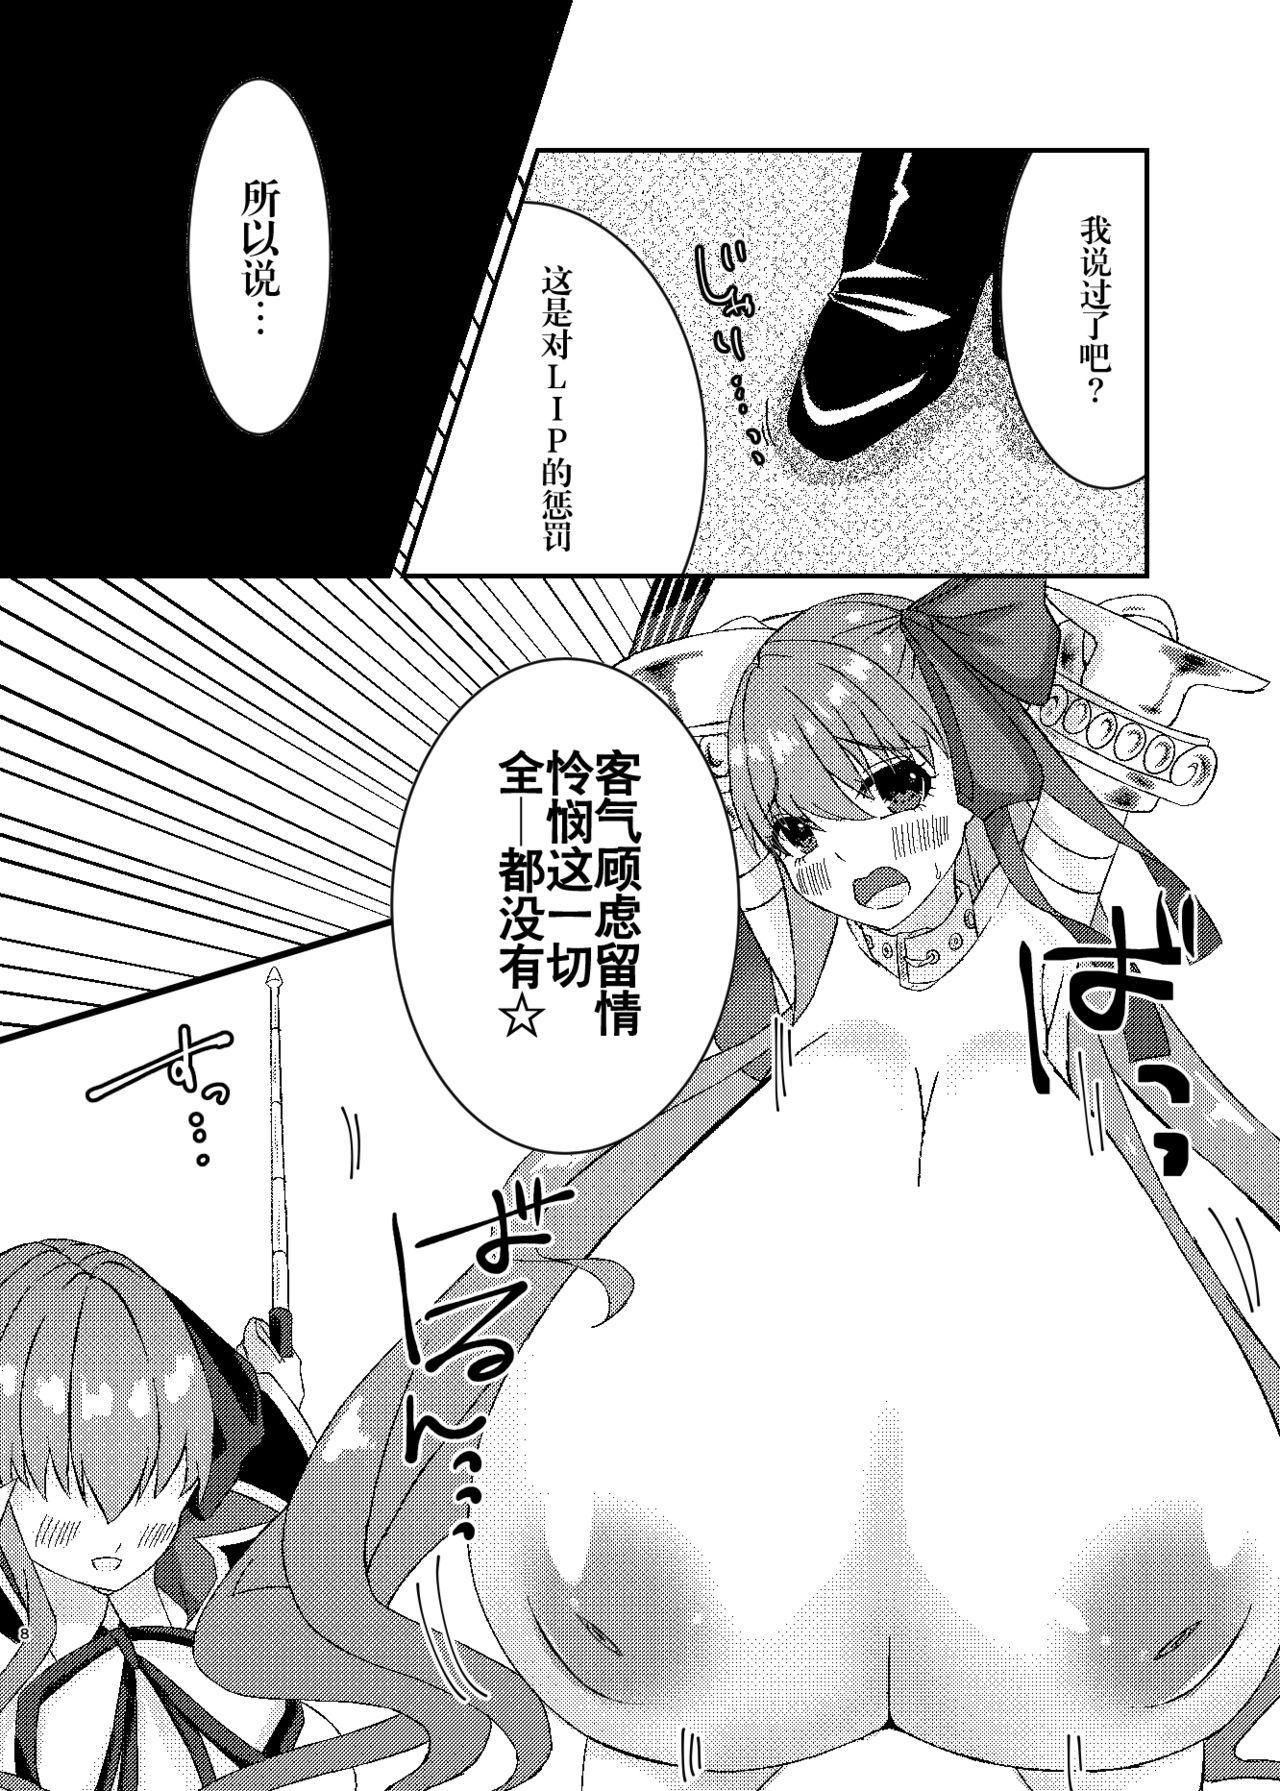 Lip no Oppai ni Oshioki desu | 要对LIP的胸部进行惩罚了 6